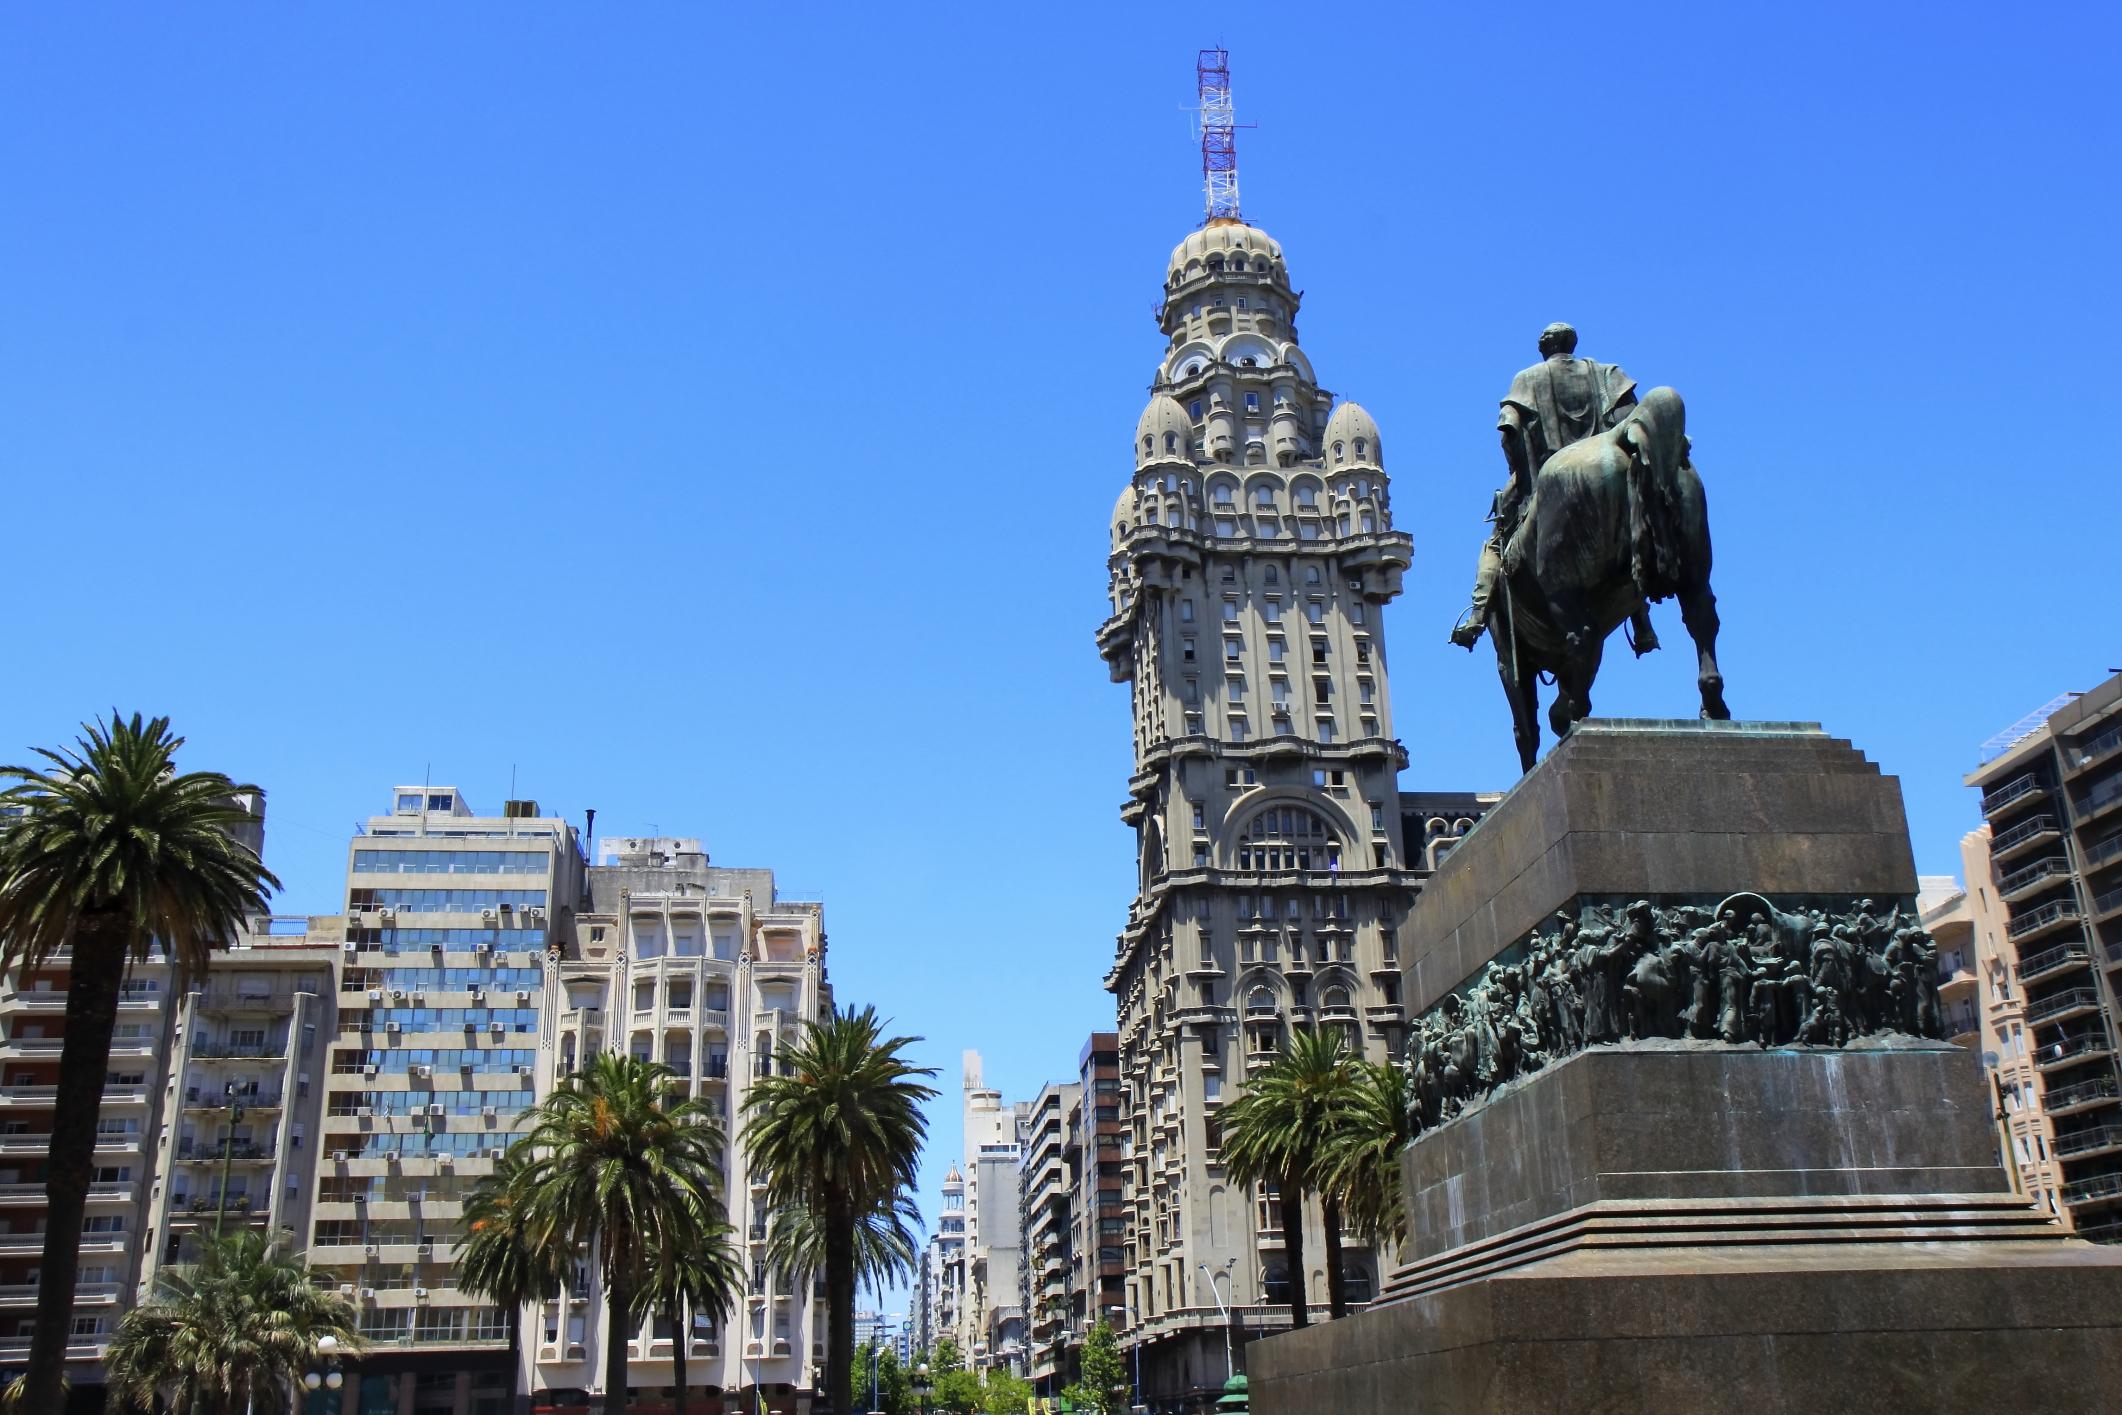 Edinson Cavani Uruguay National Team   Uruguay   Pinterest